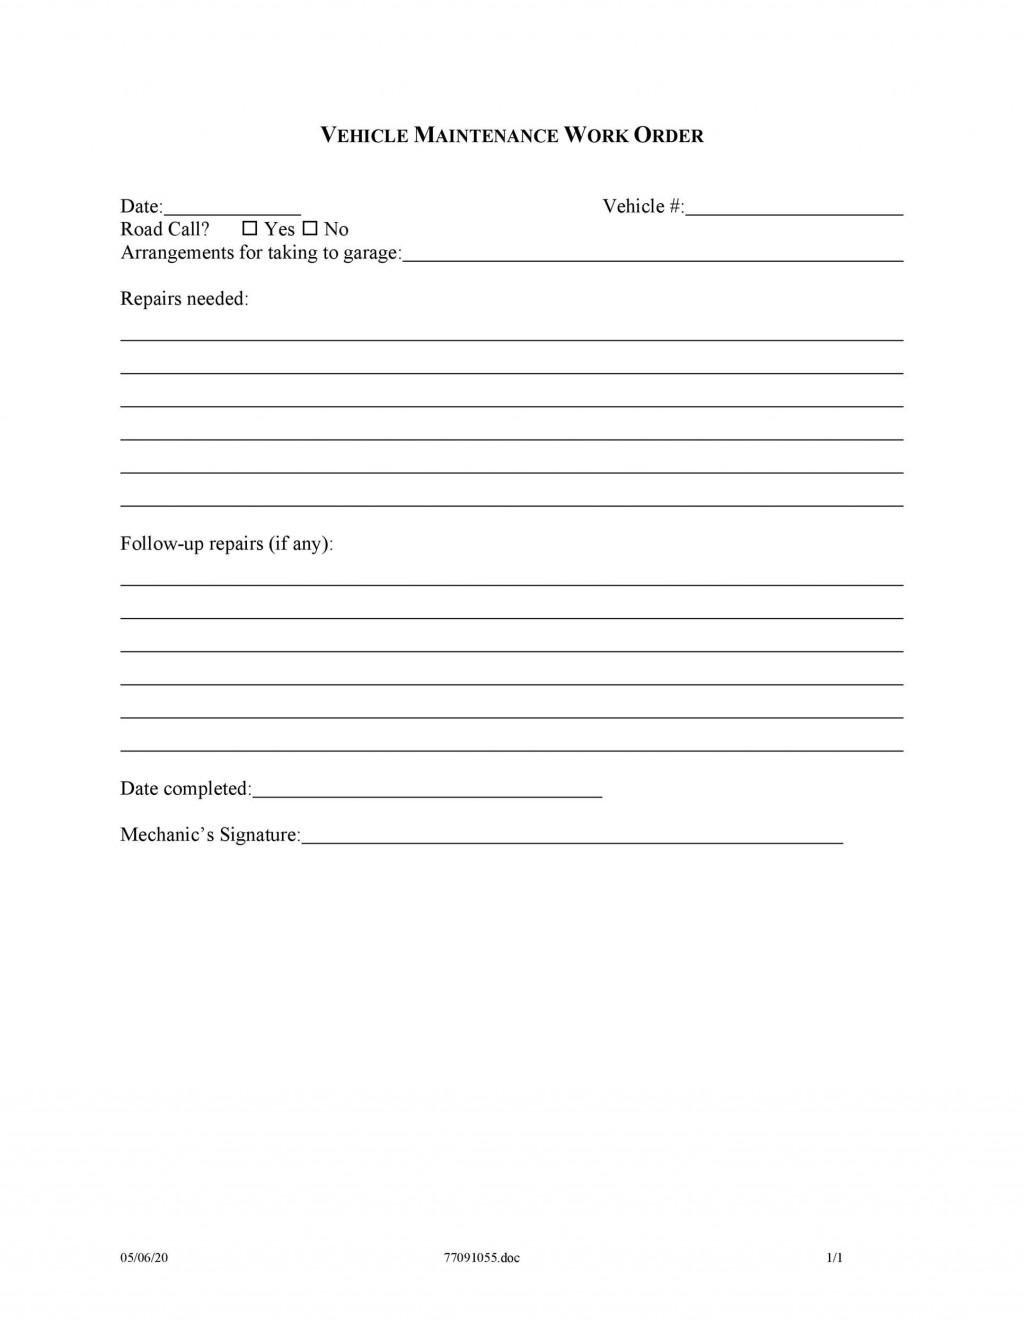 009 Sensational Maintenance Work Order Template Picture  Form Free SampleLarge